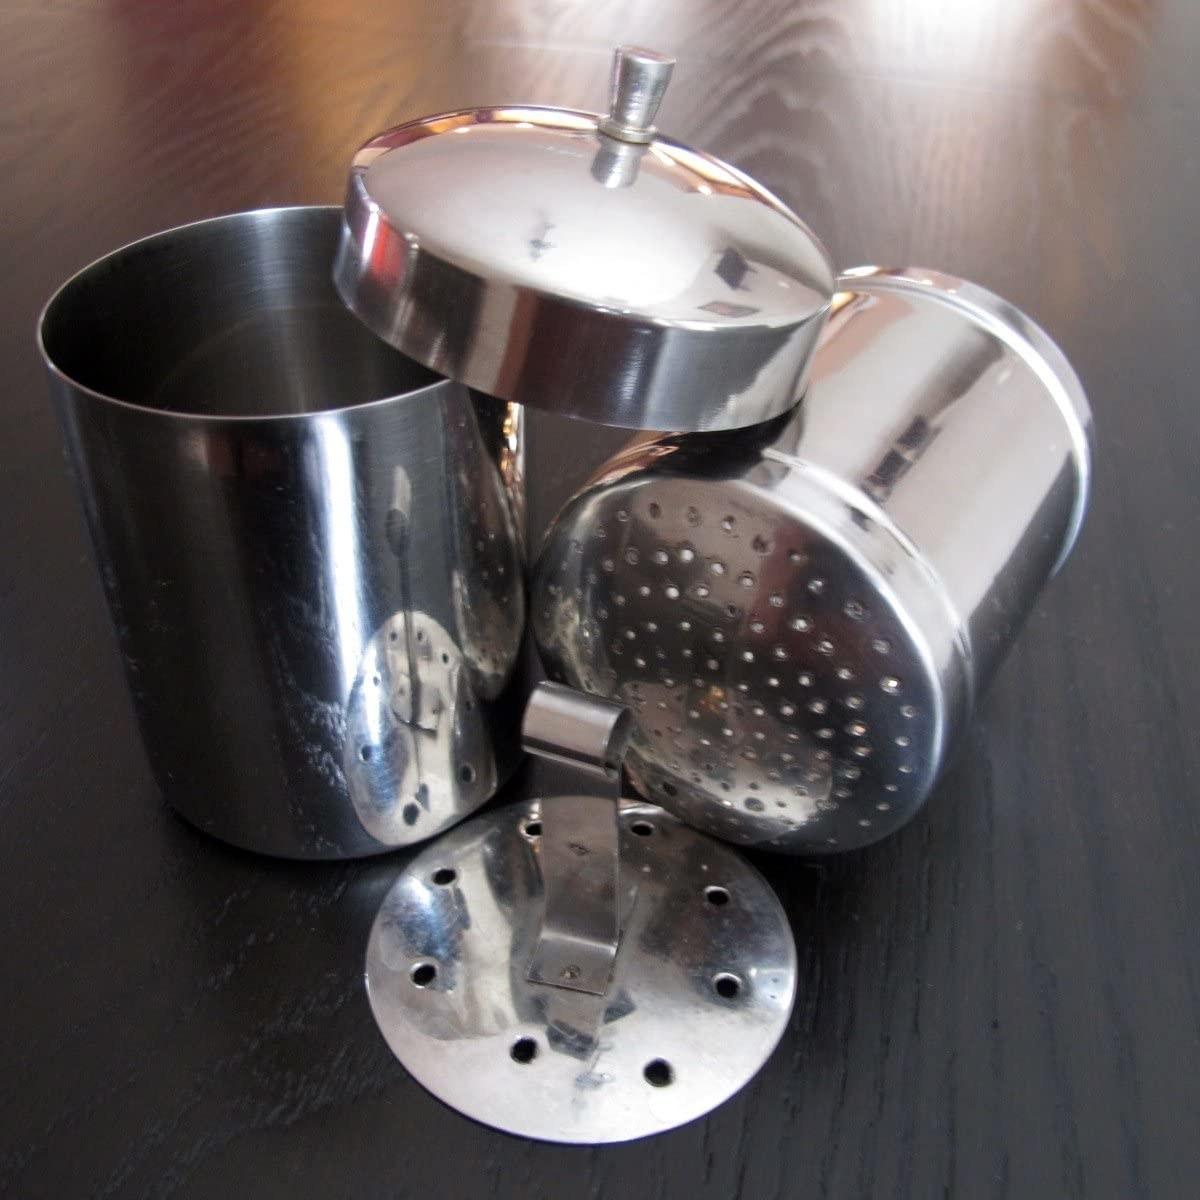 A filter coffee maker